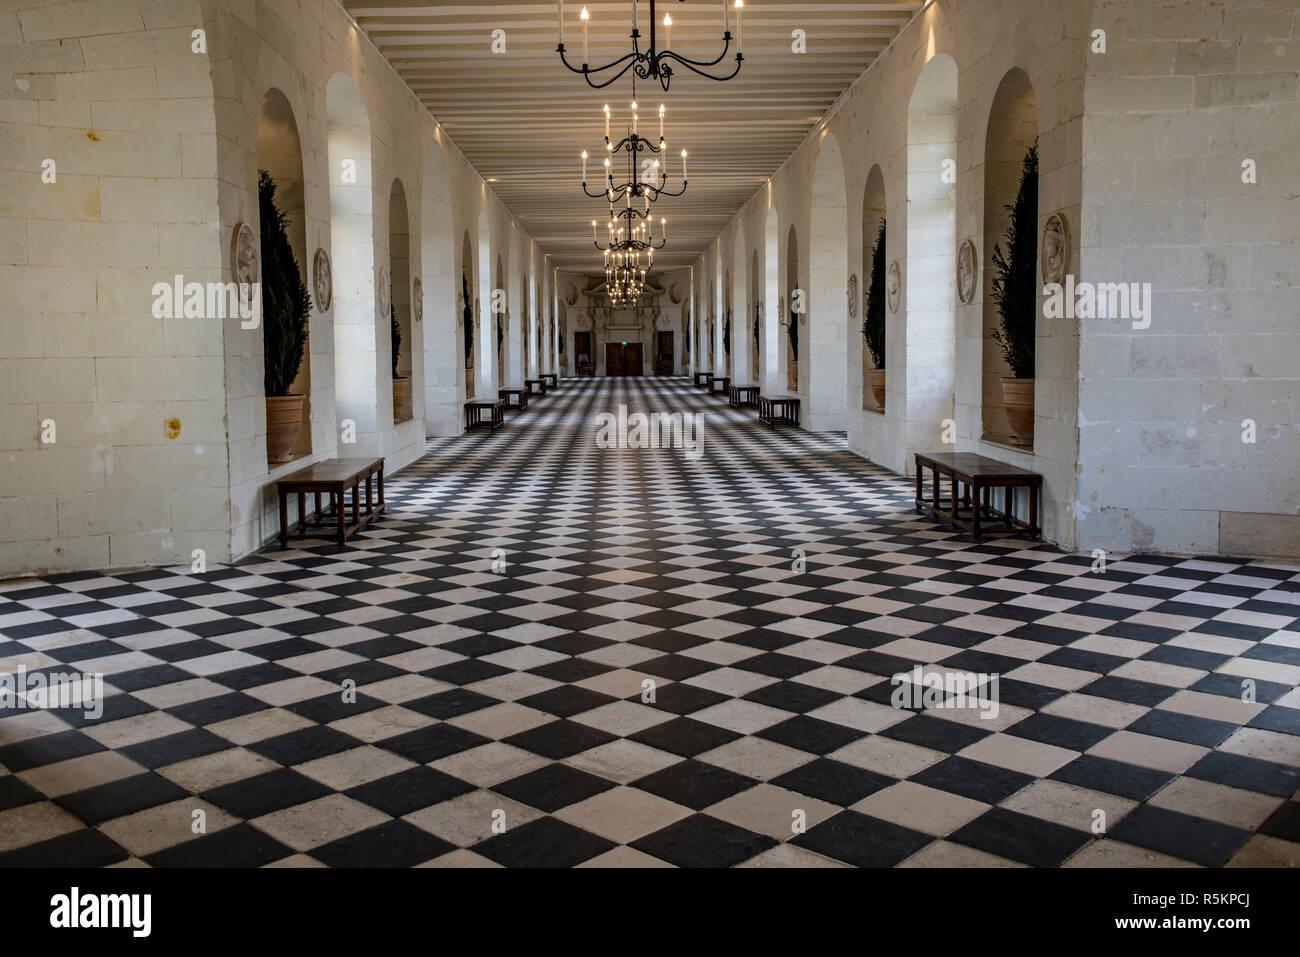 Chateau Chenonceau Gallery Immagini e Fotos Stock - Alamy